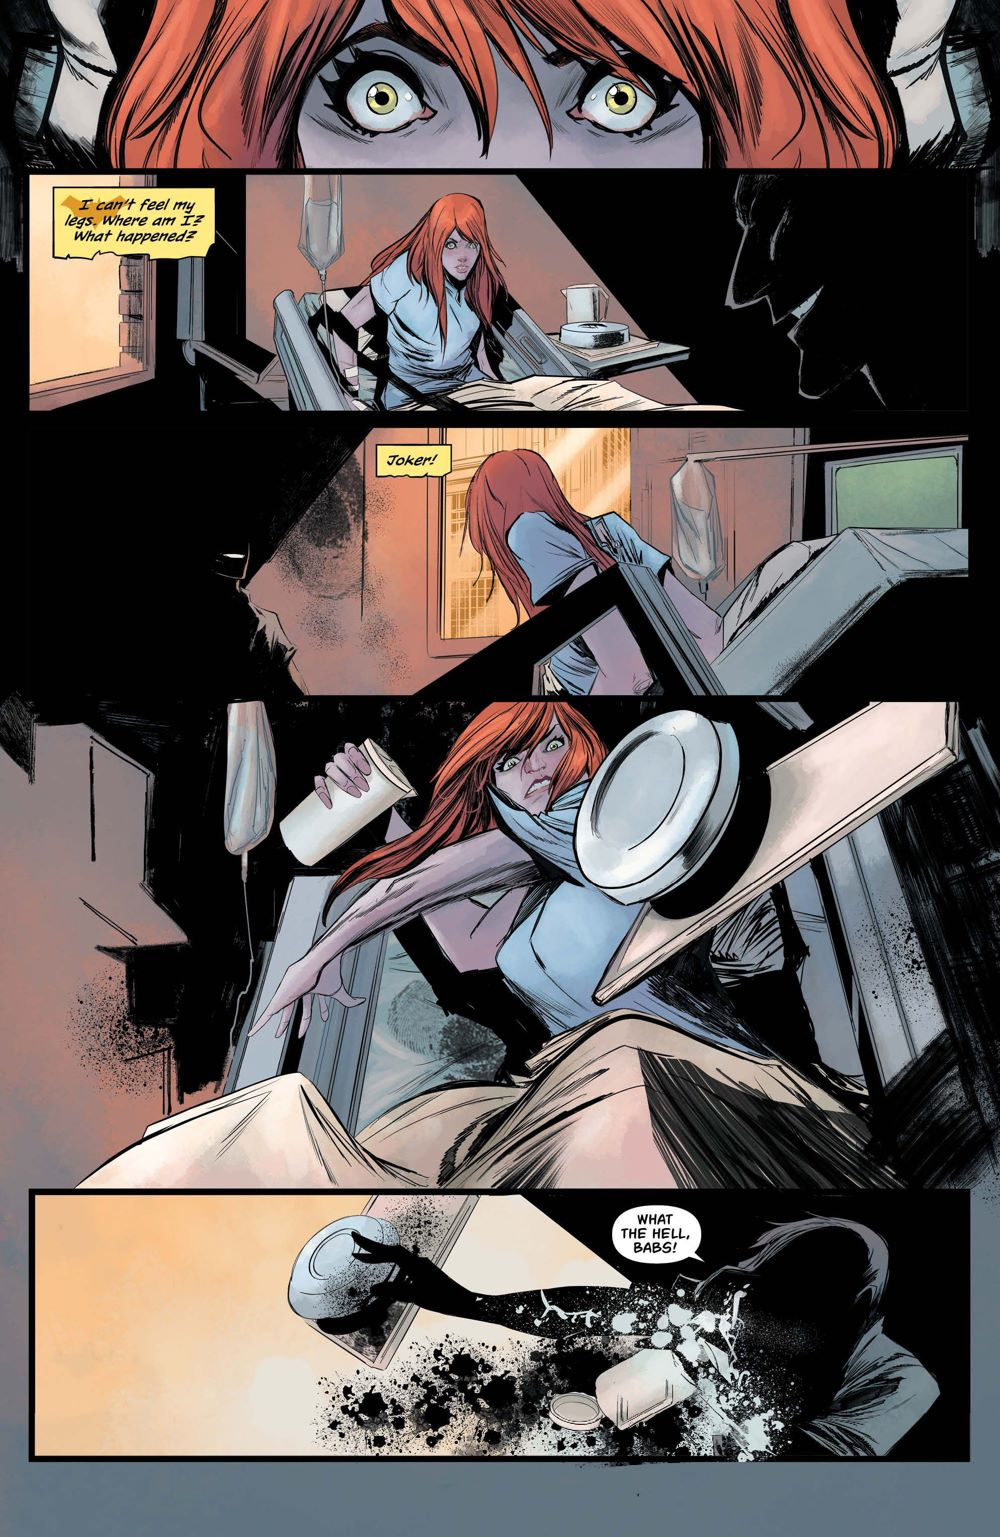 BG-48-4 ComicList Previews: BATGIRL #48